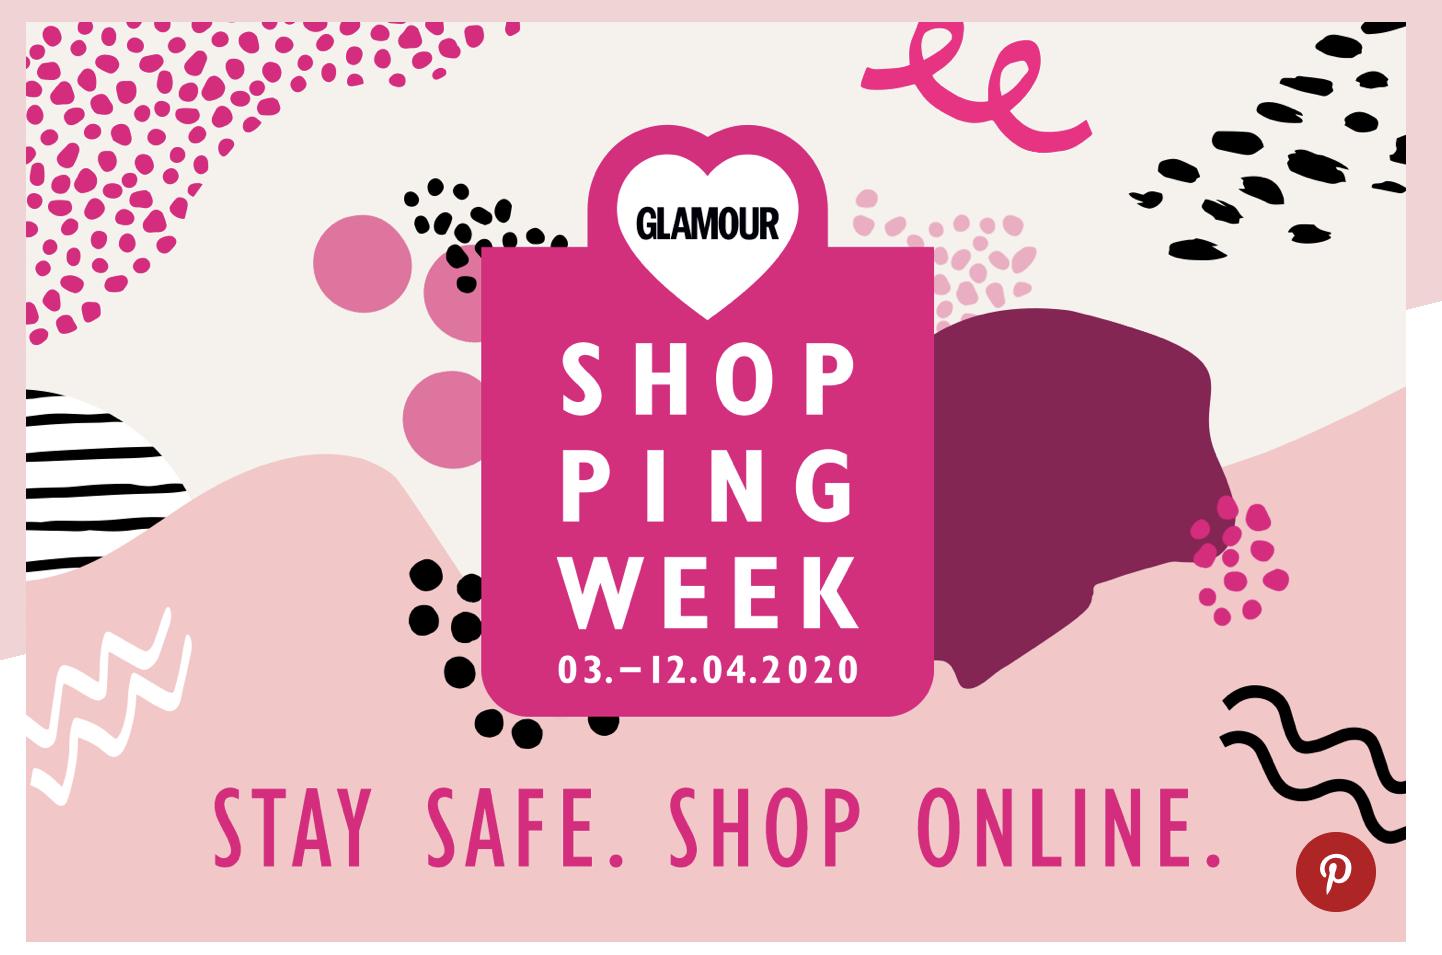 GLAMOUR-Shopping Cards gratis + aktuelle Ausgabe der GLAMOUR als E-Paper